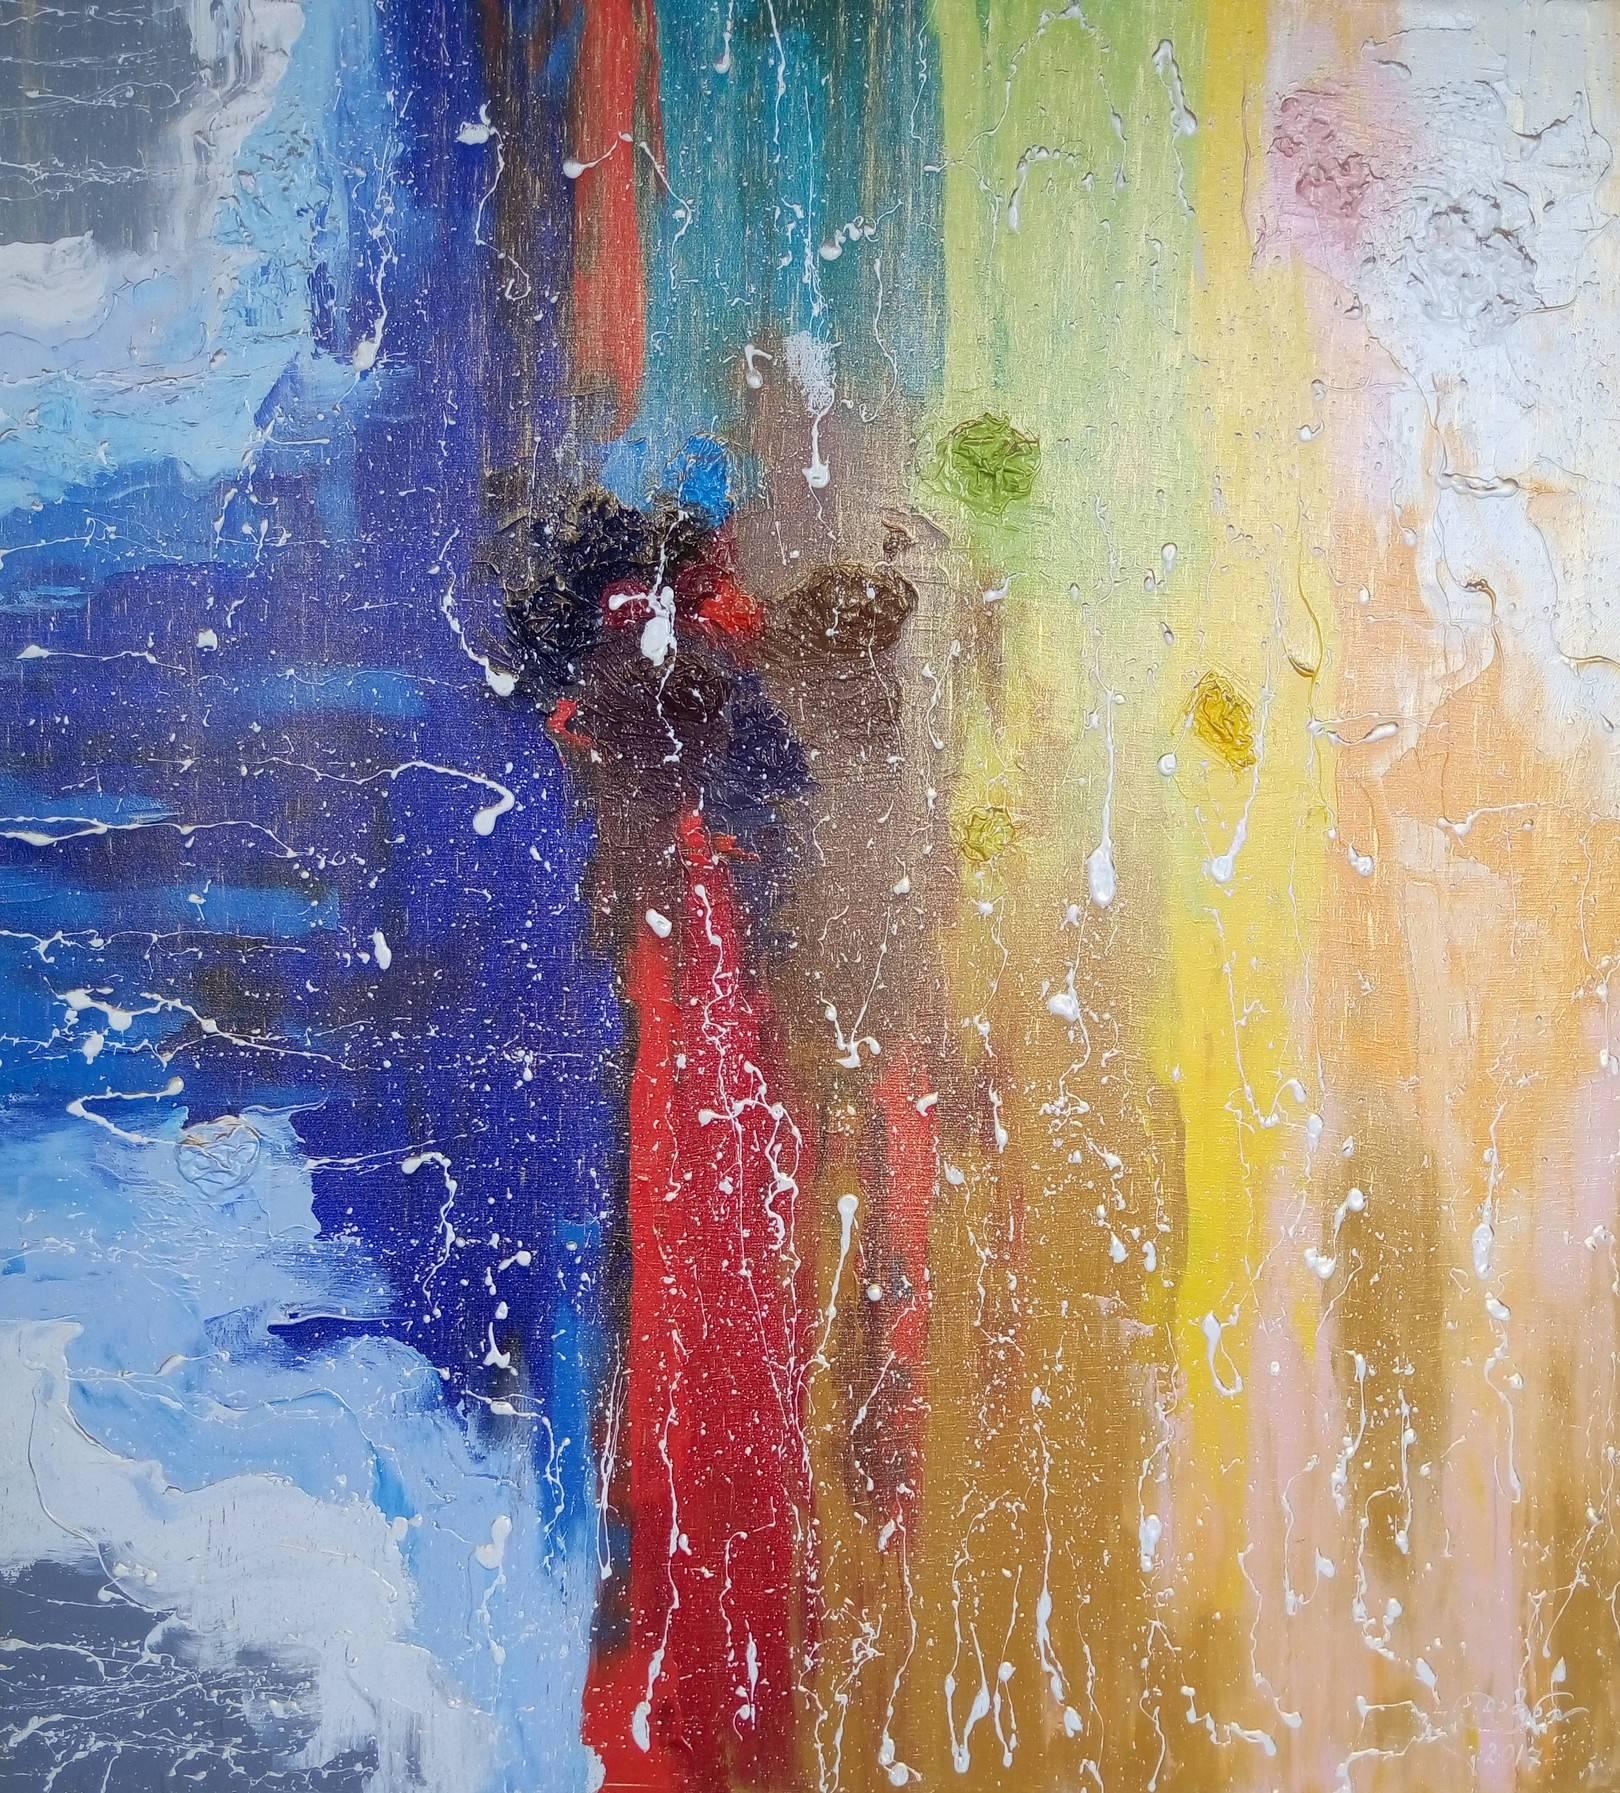 «Разрозненность бытия»               холст, масло «Disunity of Being»                          oil on canvas  80x80, 2017